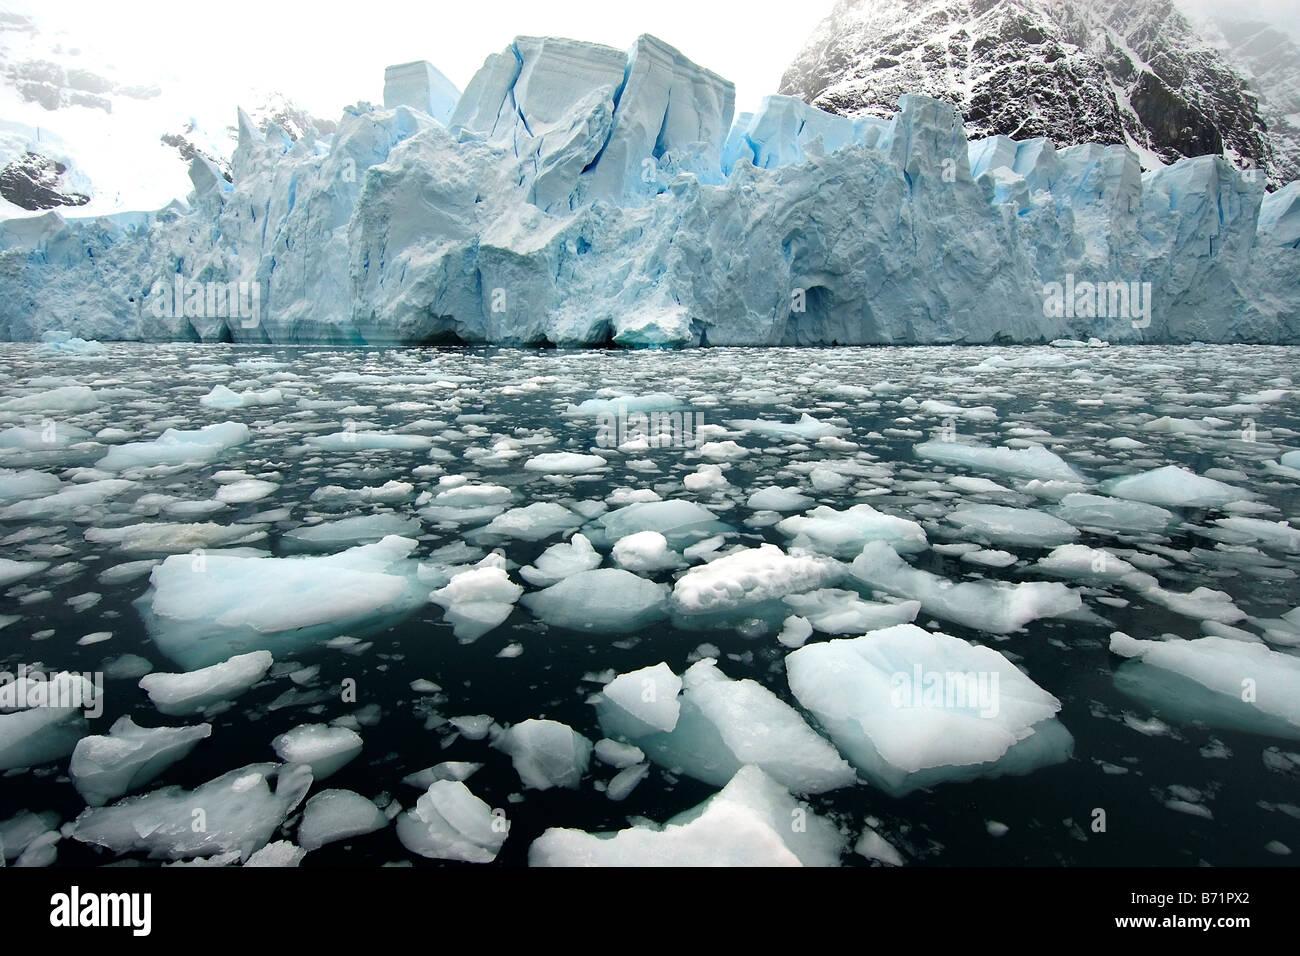 Antartica Glaciar, abgelegenen Ort, wilder Ort, Kälte, Eis, Schnee, Eisblöcke Stockbild